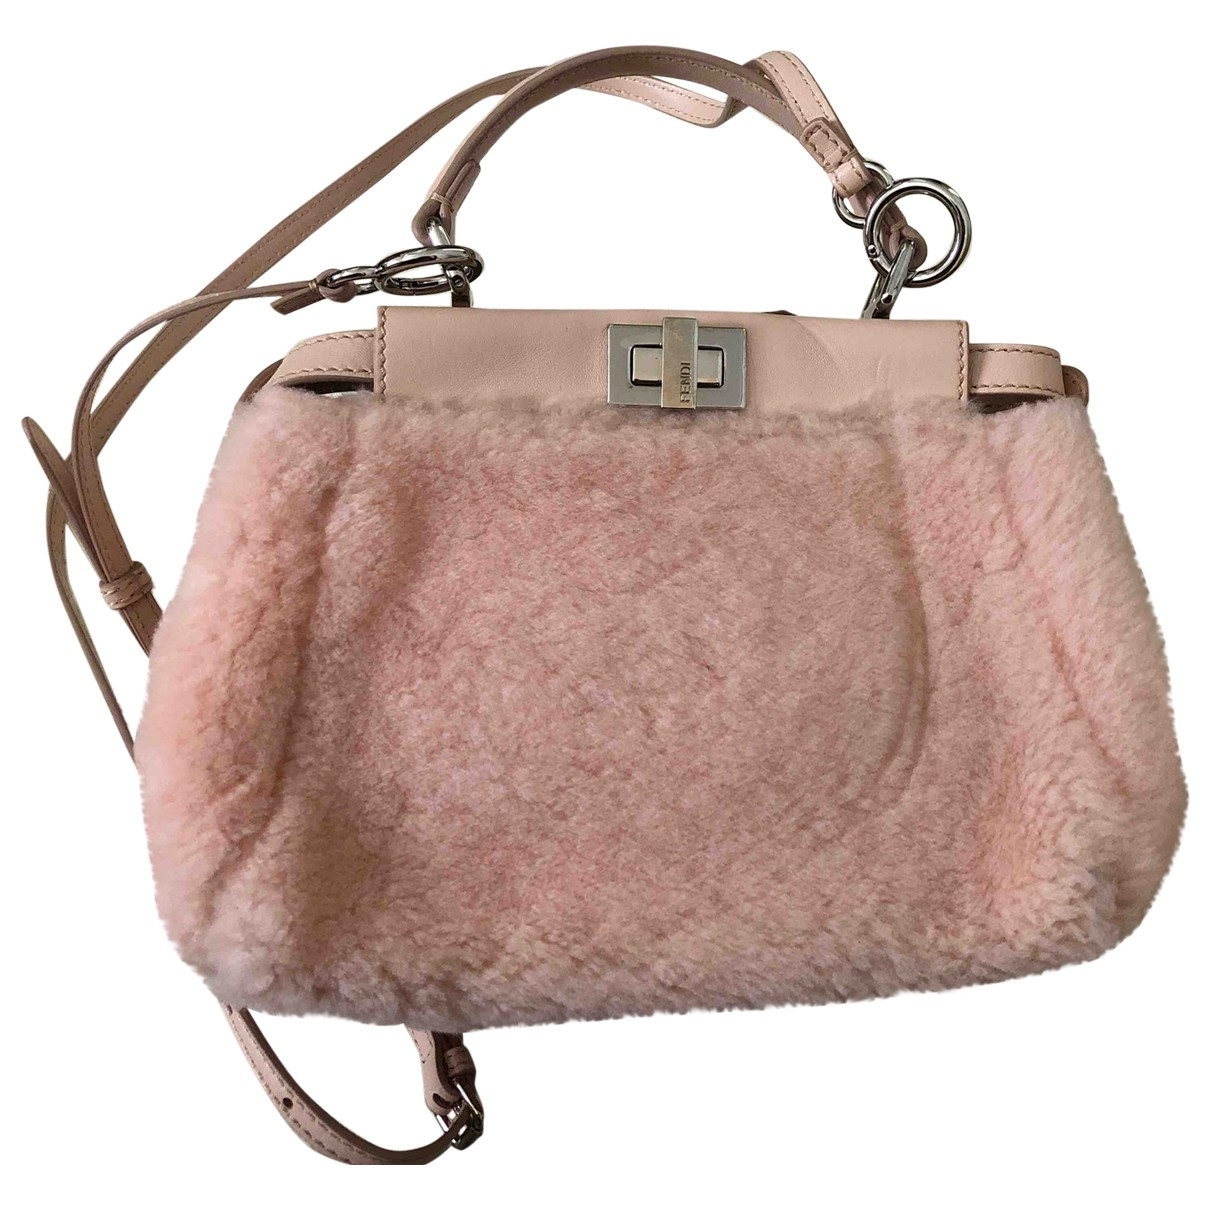 Fendi Peekaboo Handtasche in  Rosa Synthetikpelz